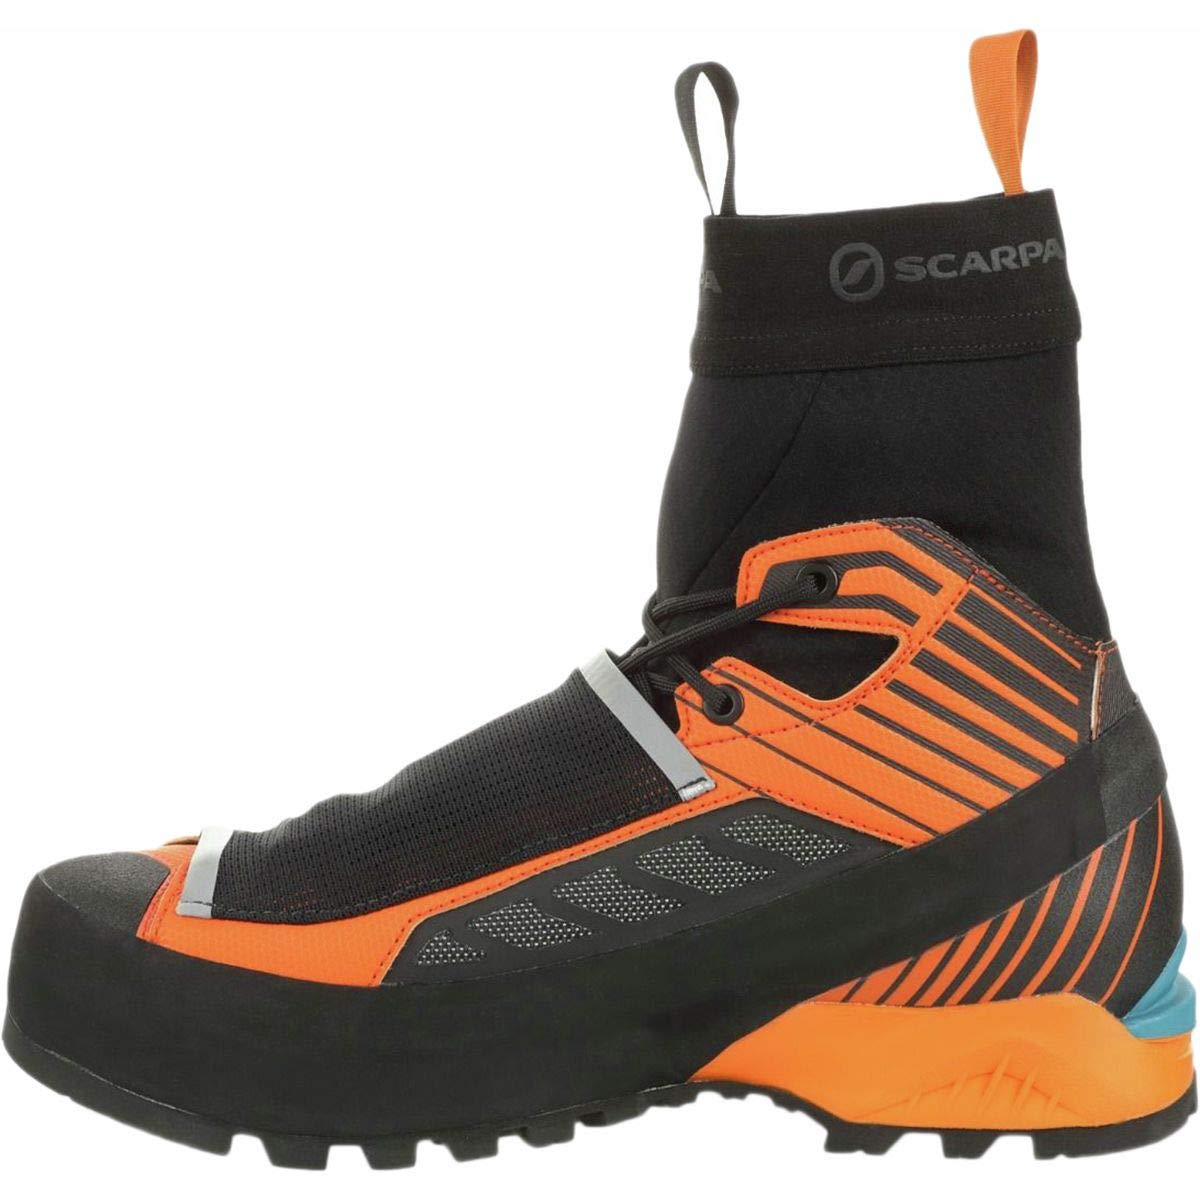 SCARPA Ribelle Tech OD Mountaineering Boot